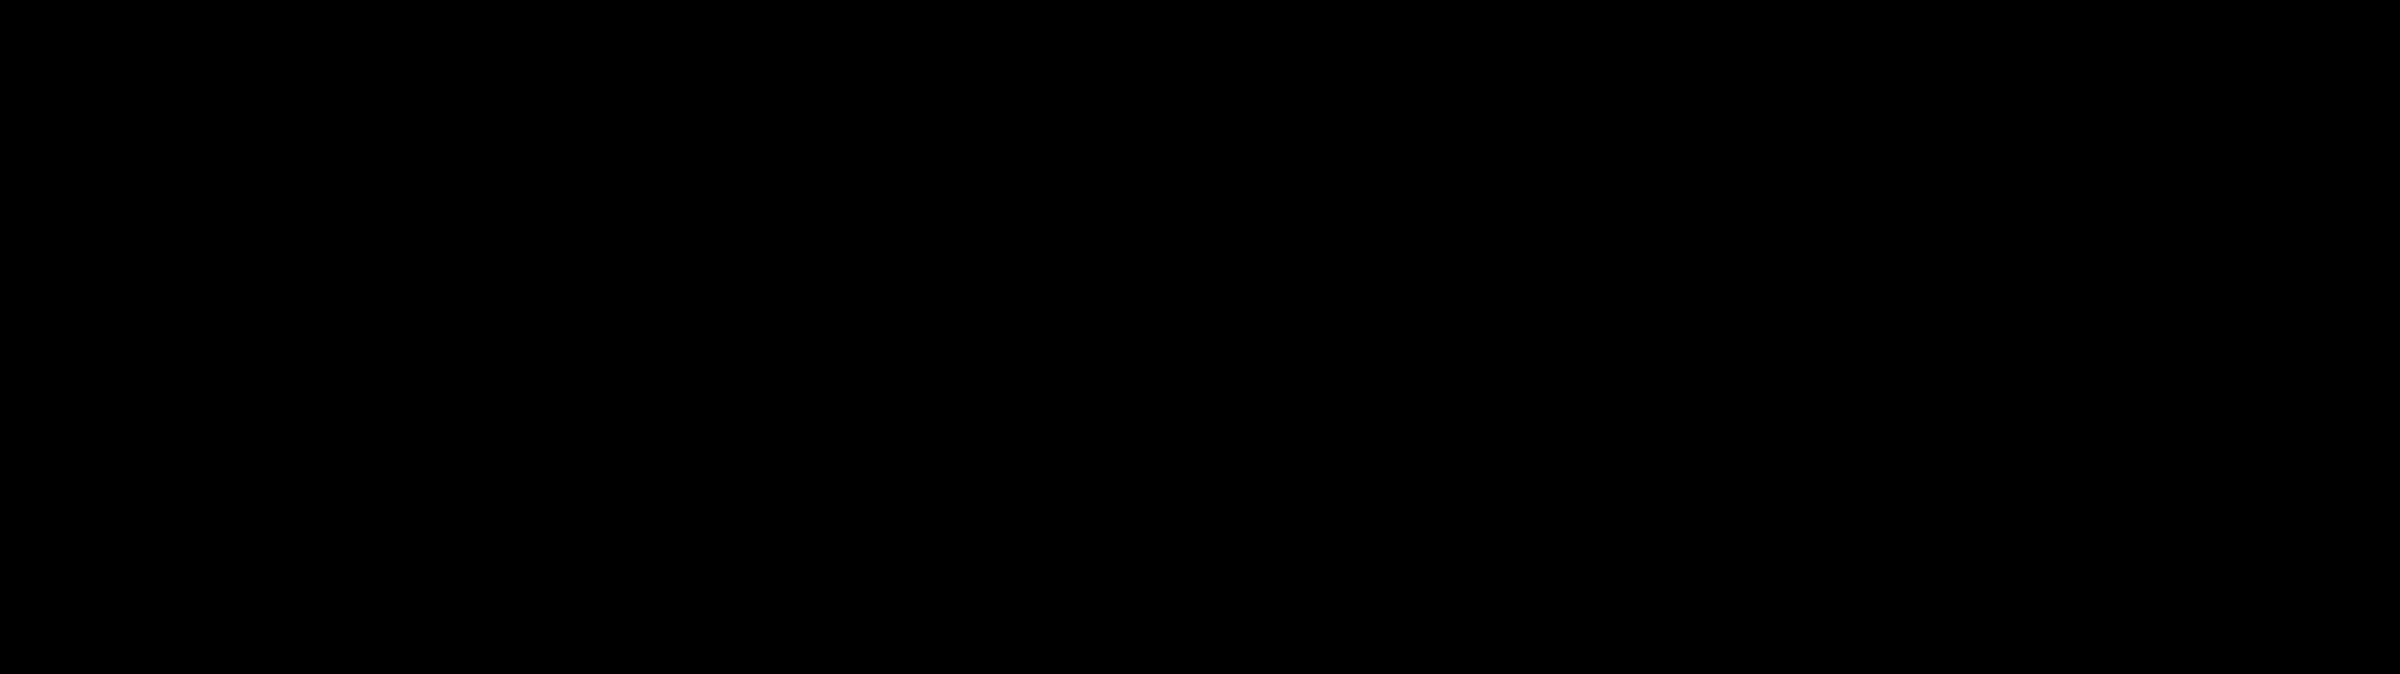 Clipart Ichthys Christianity Symbol